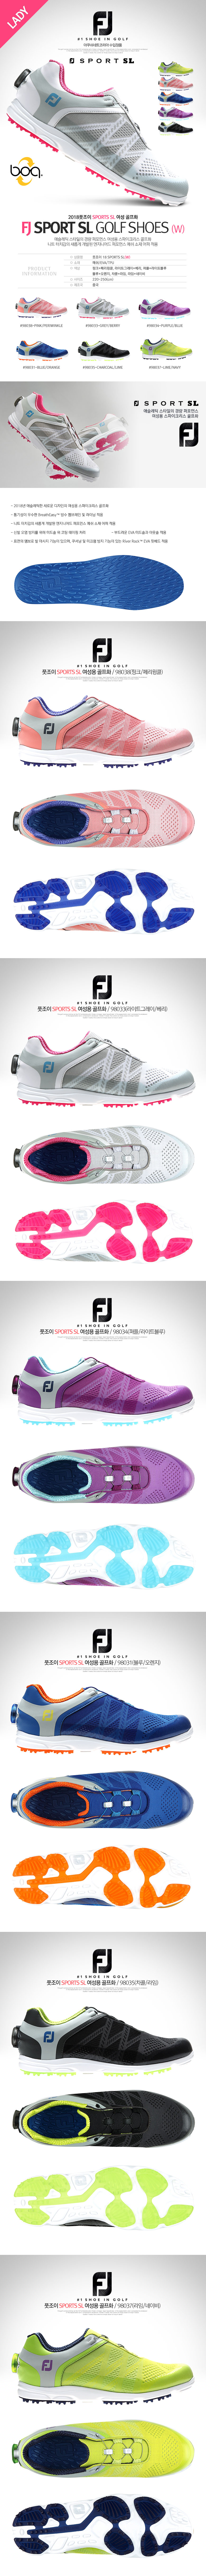 fj_18sports_sl_ladyshoes.jpg